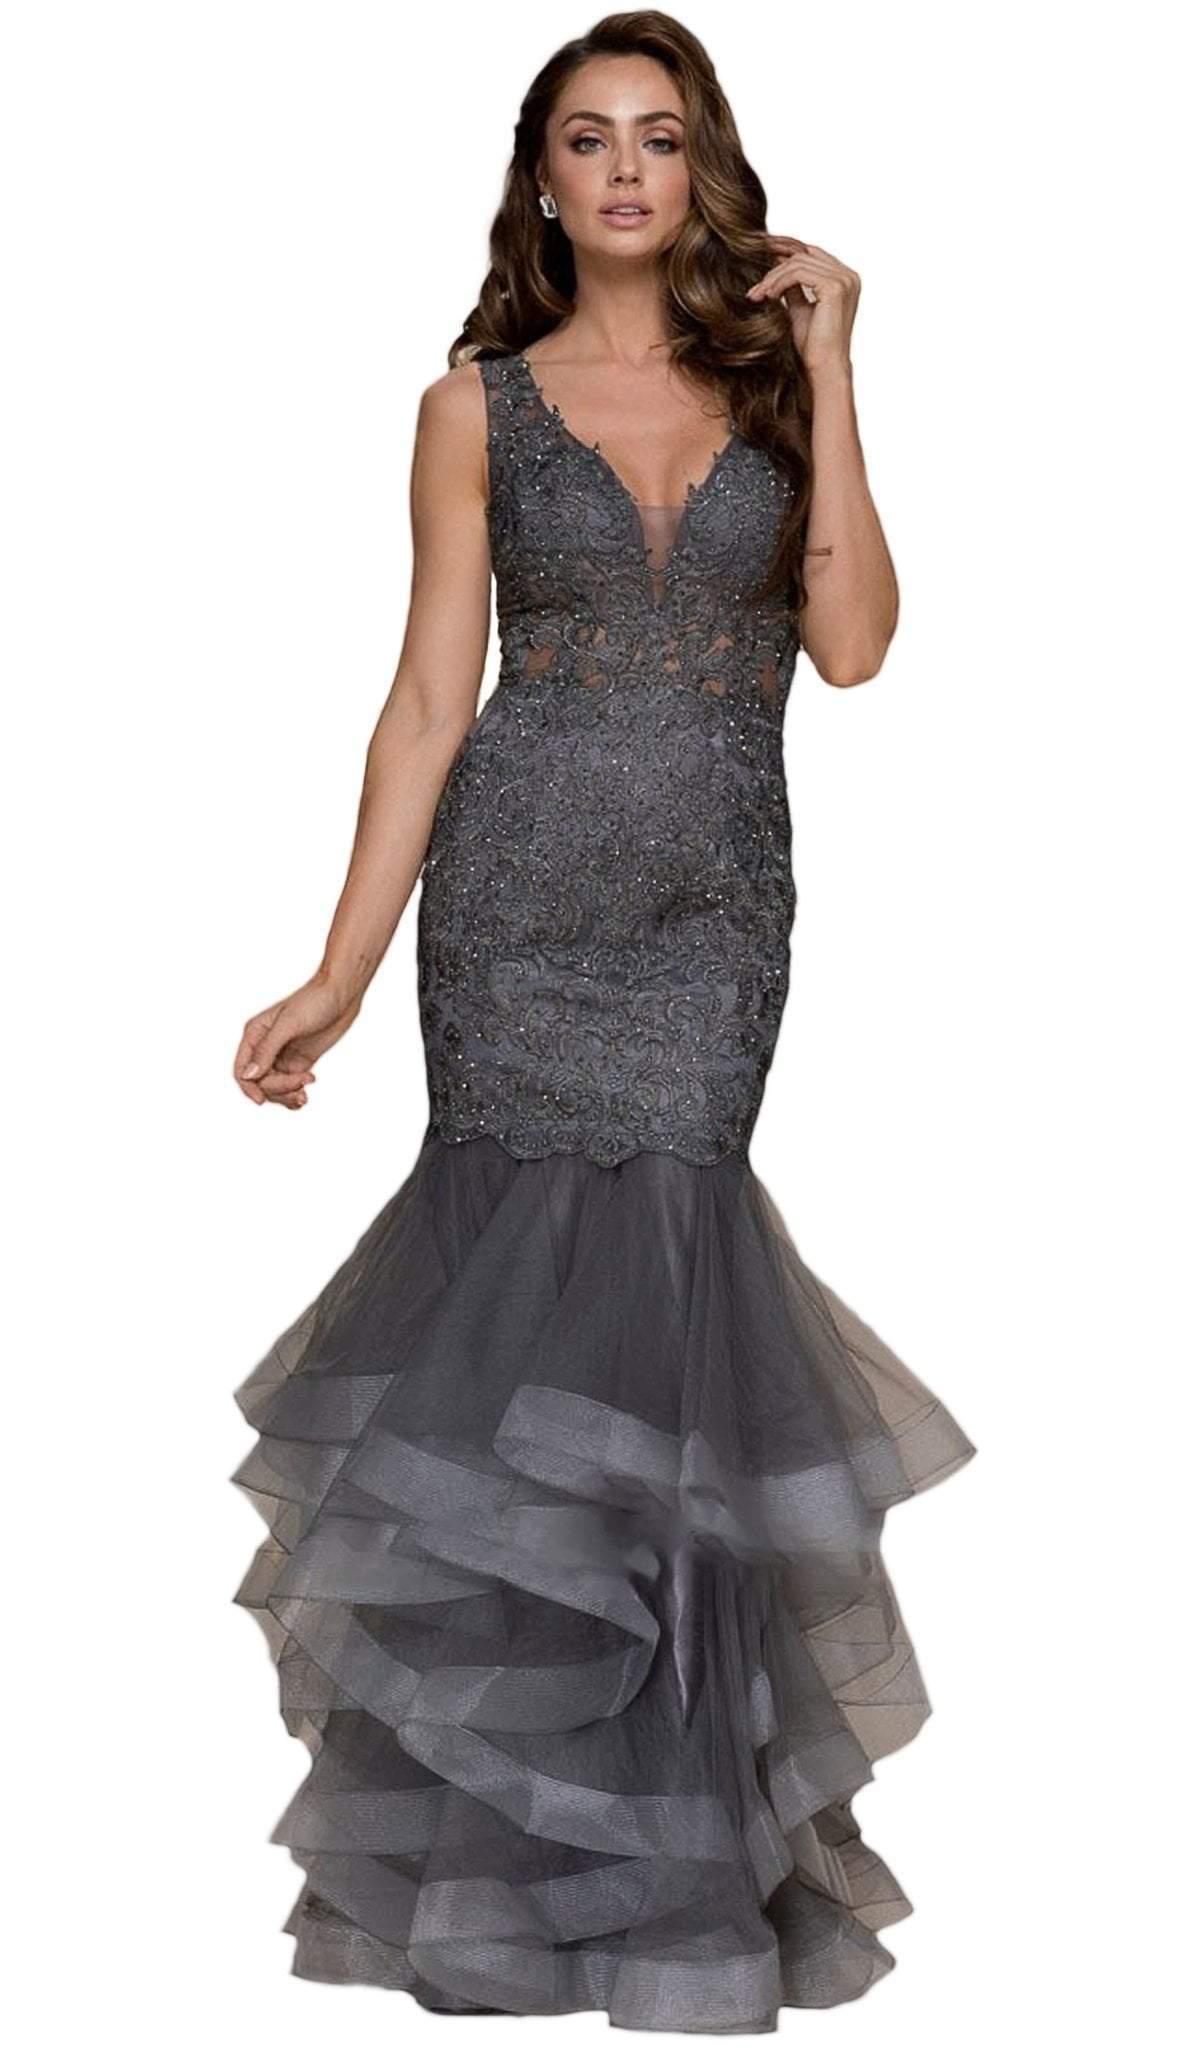 Nox Anabel - A059 Beaded Lace Ruffled Mermaid Dress